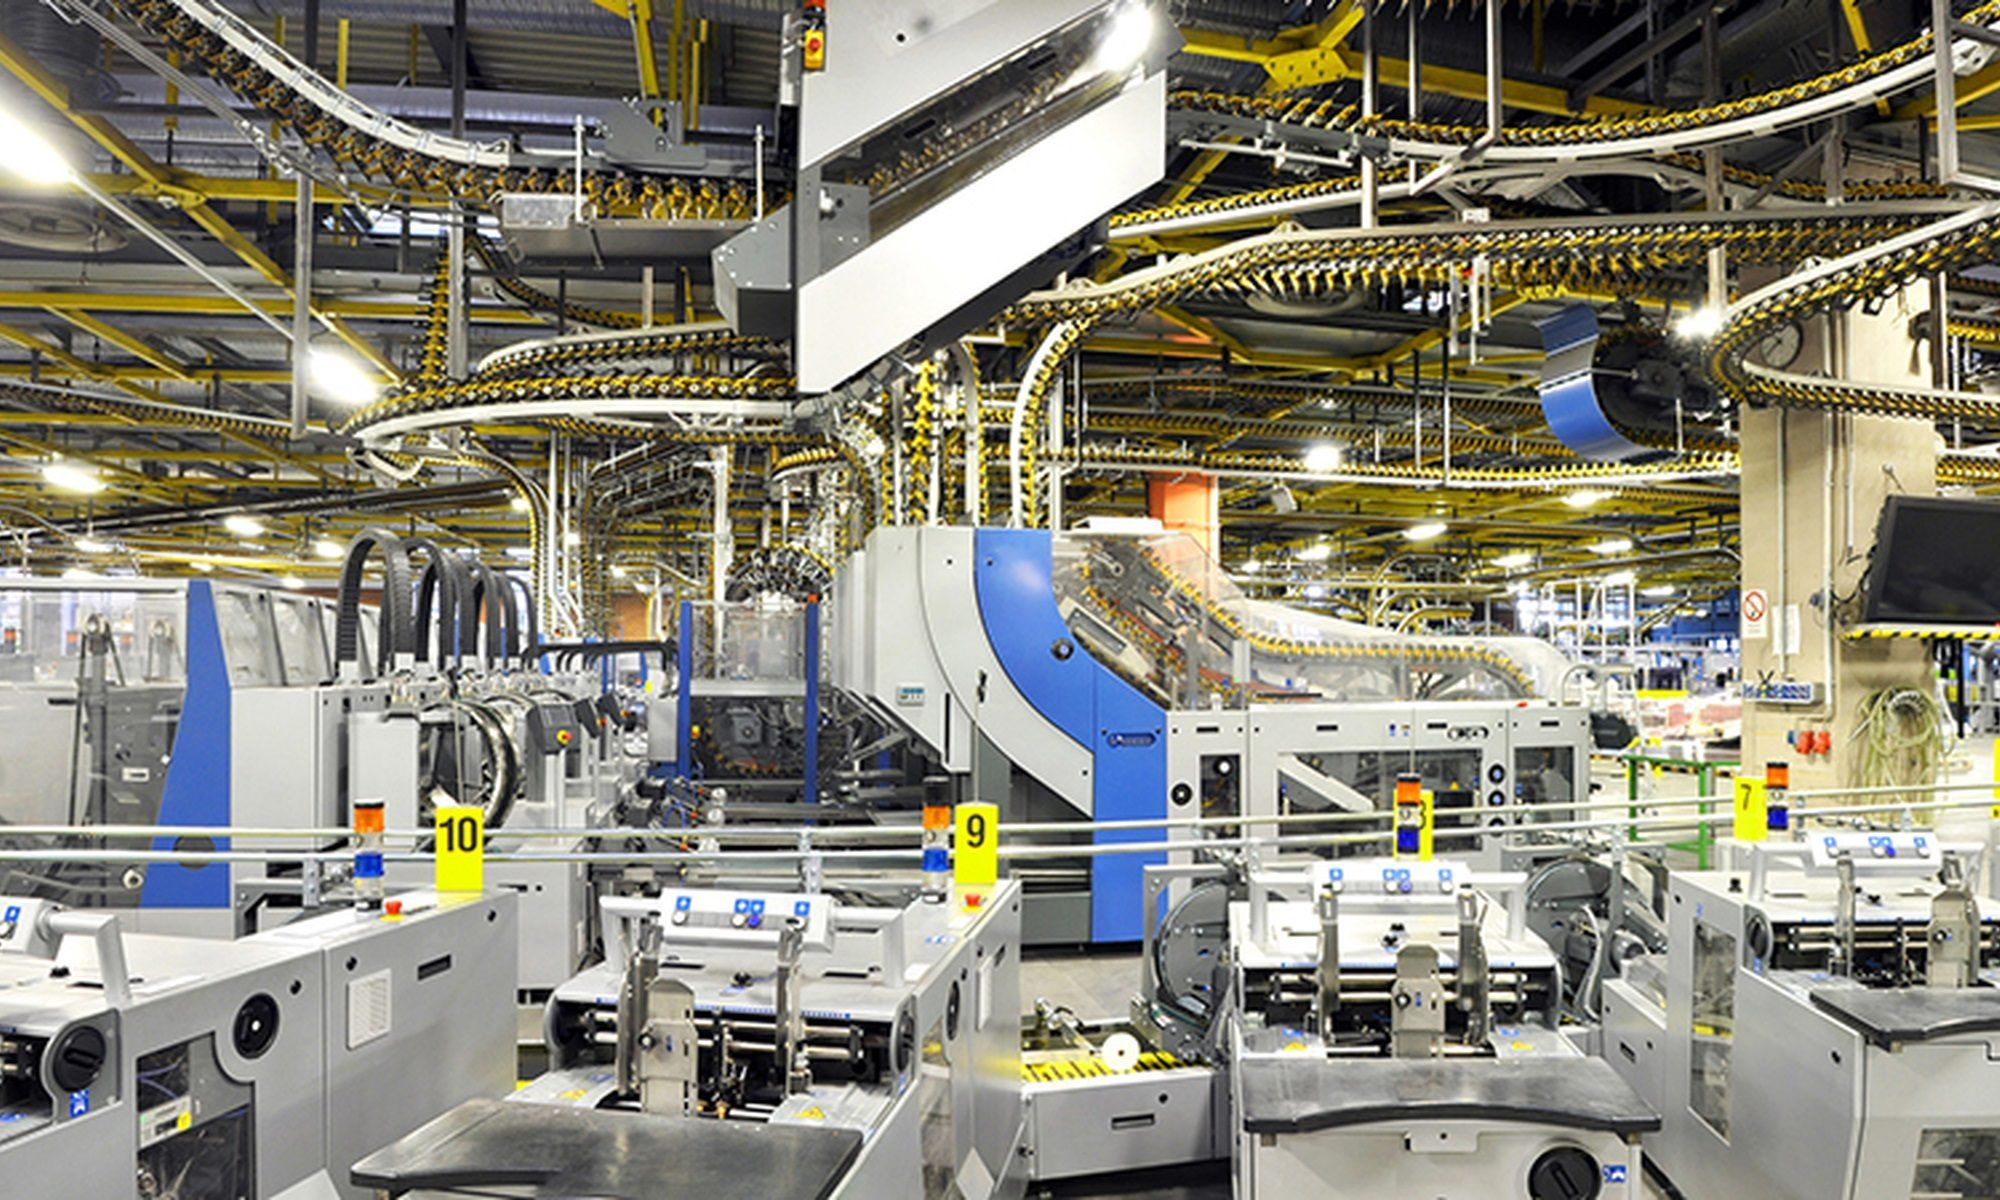 Automation of Logistics